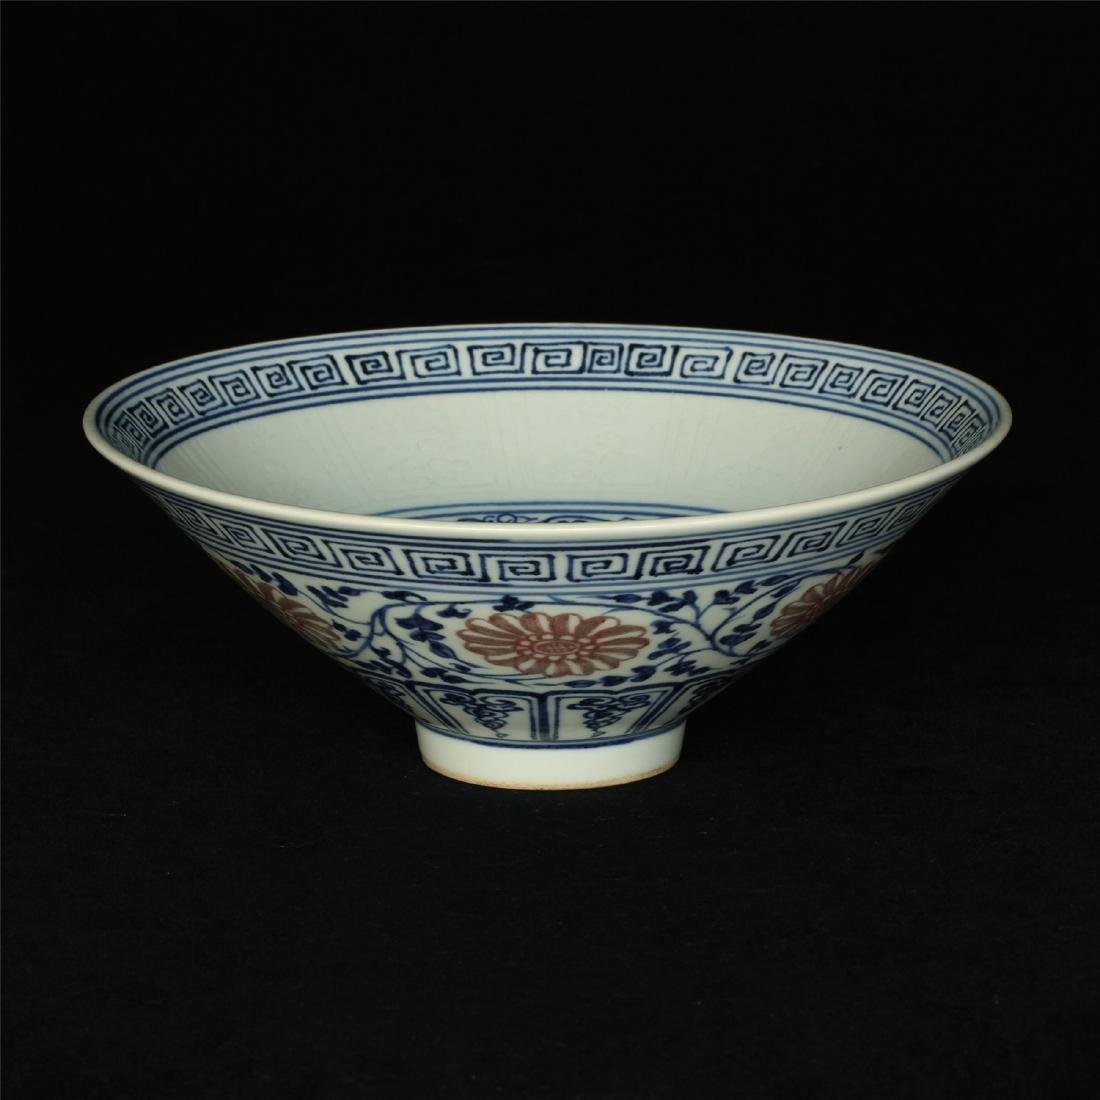 Blue and white & underglaze red porcelain bowl.